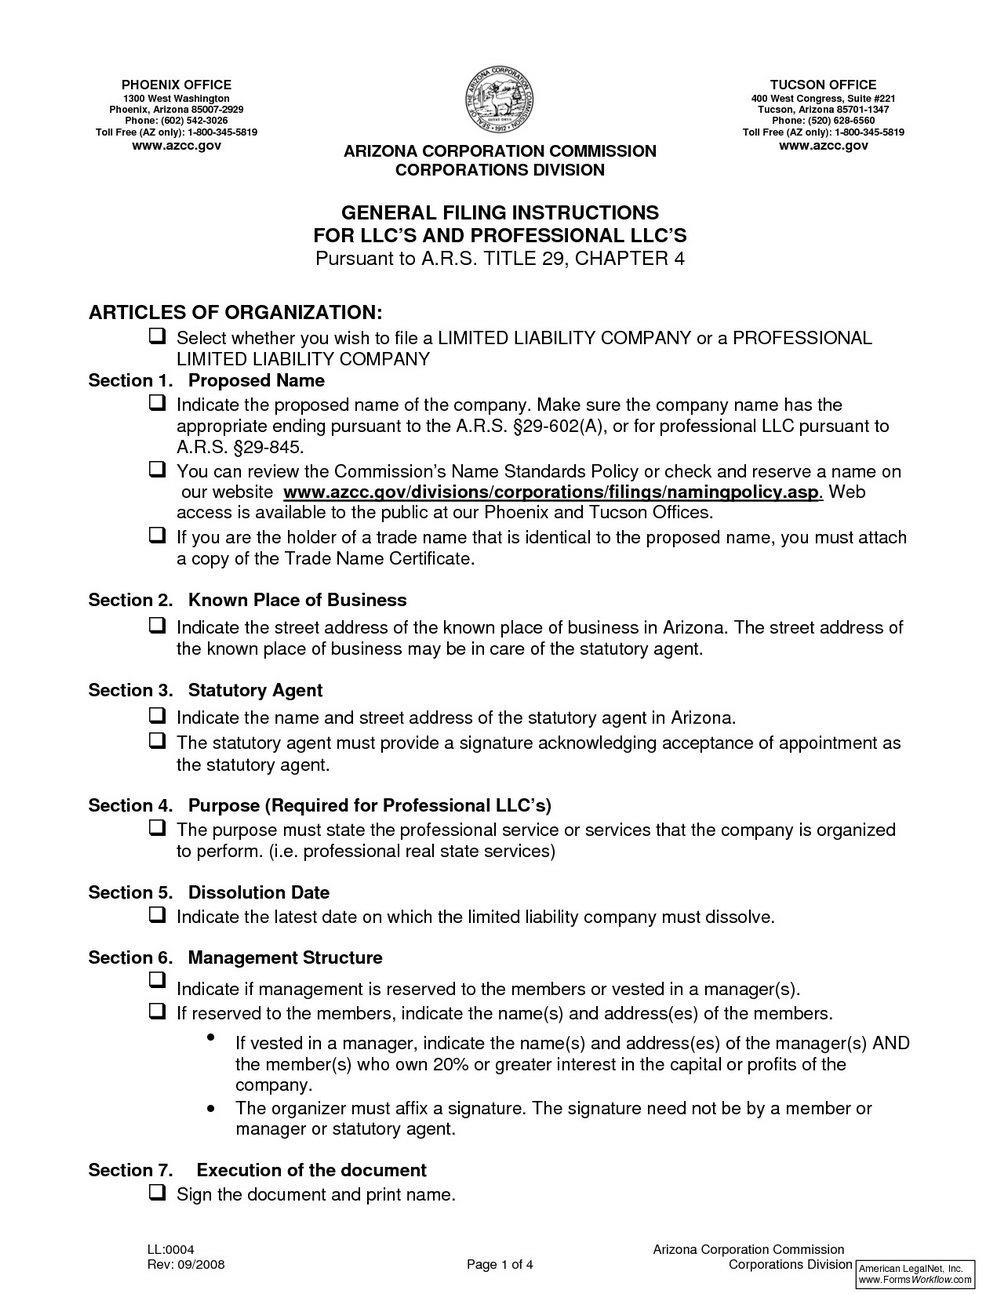 Articles Of Organization Llc Template